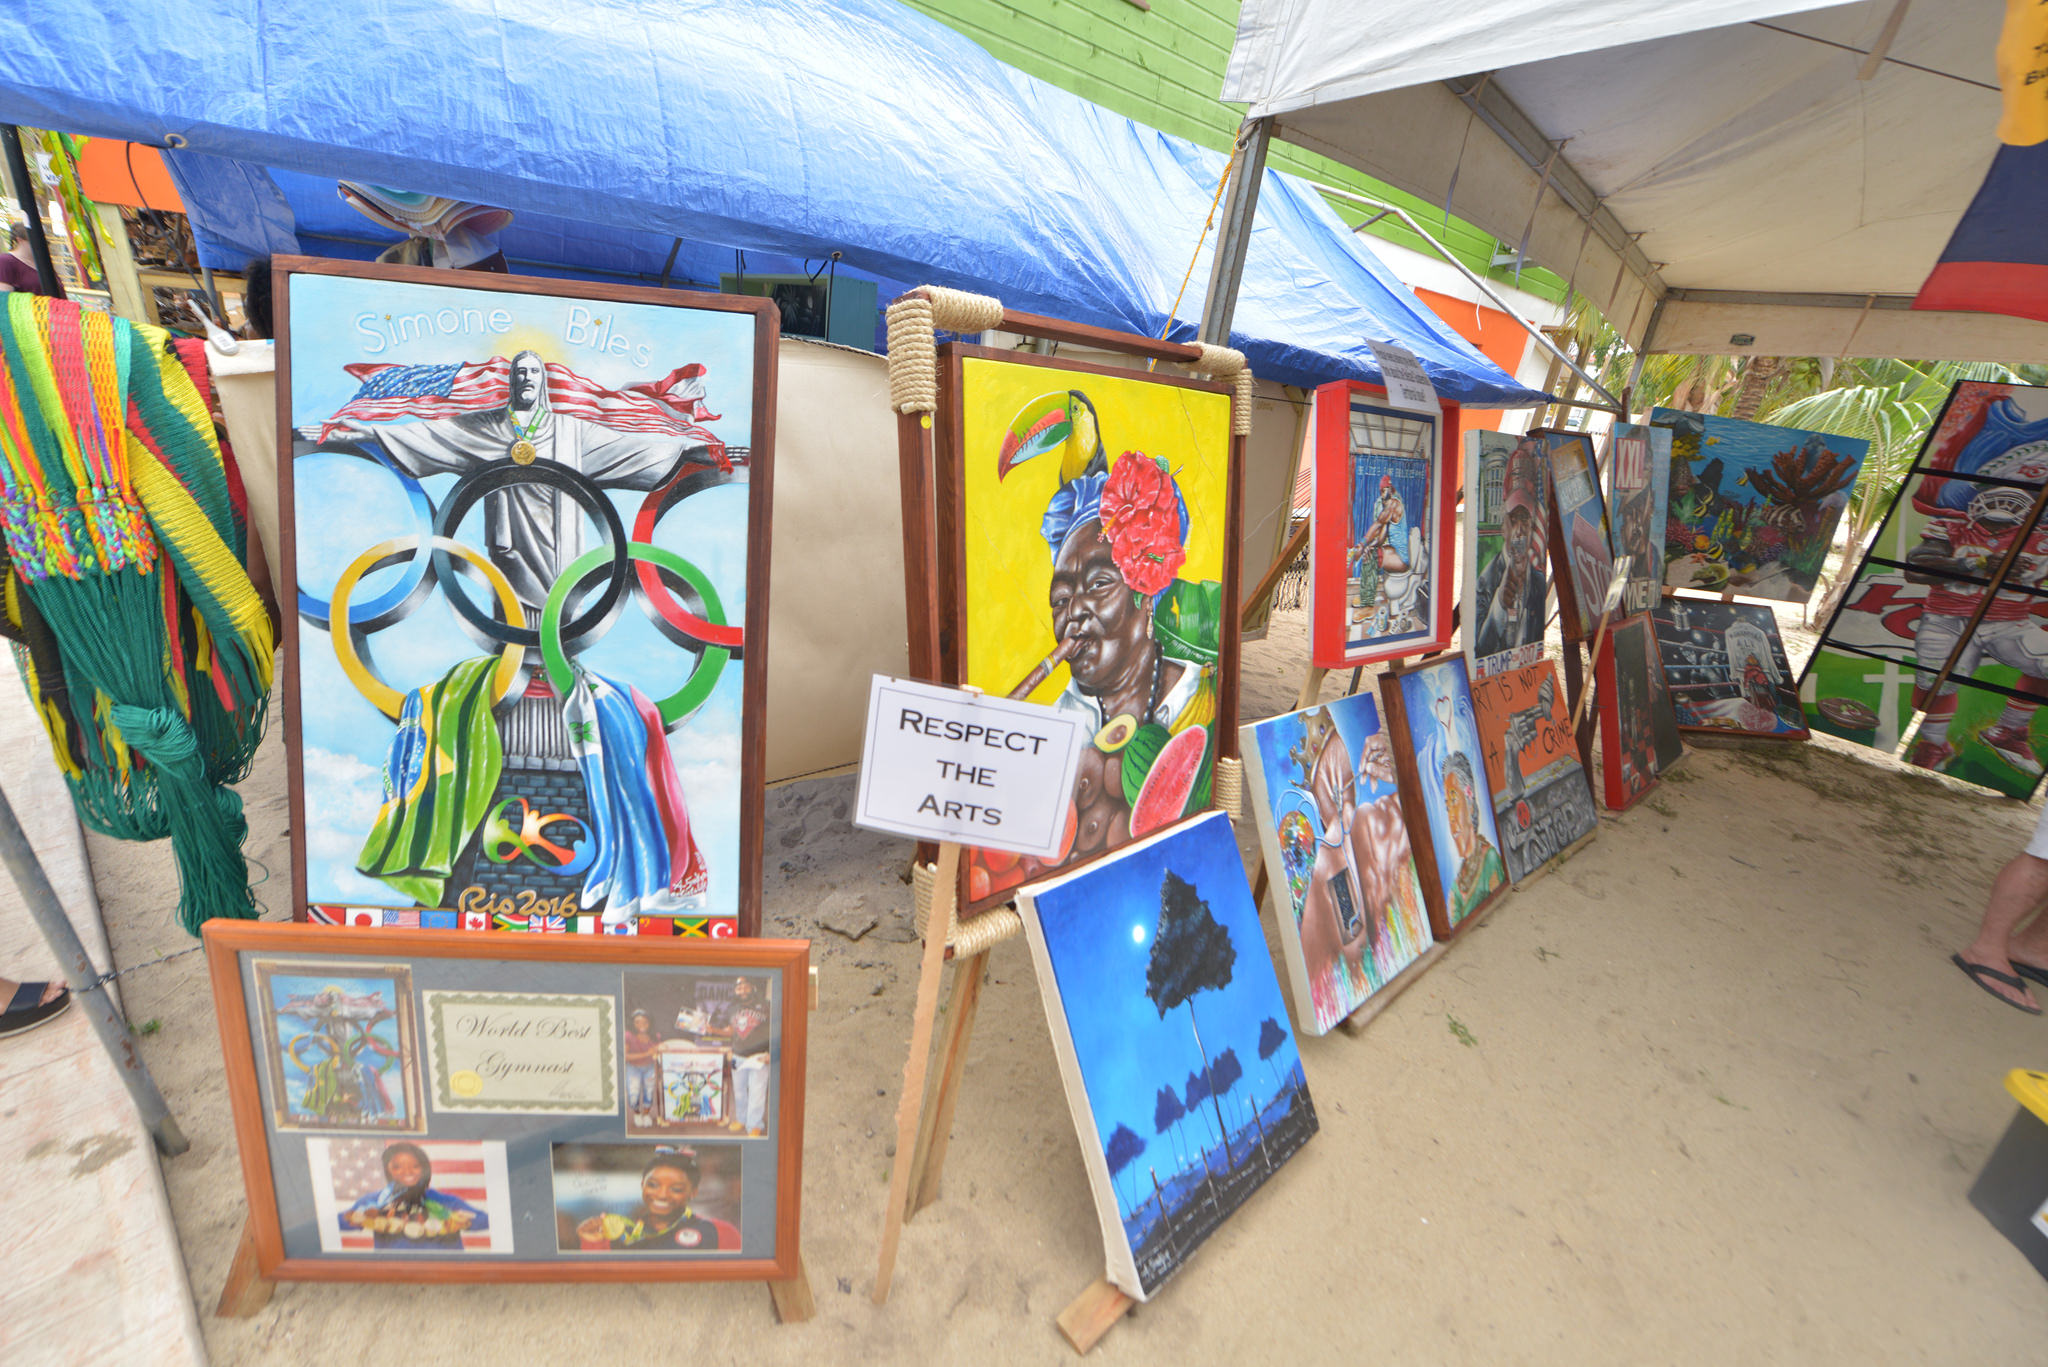 Placencia Street Festival